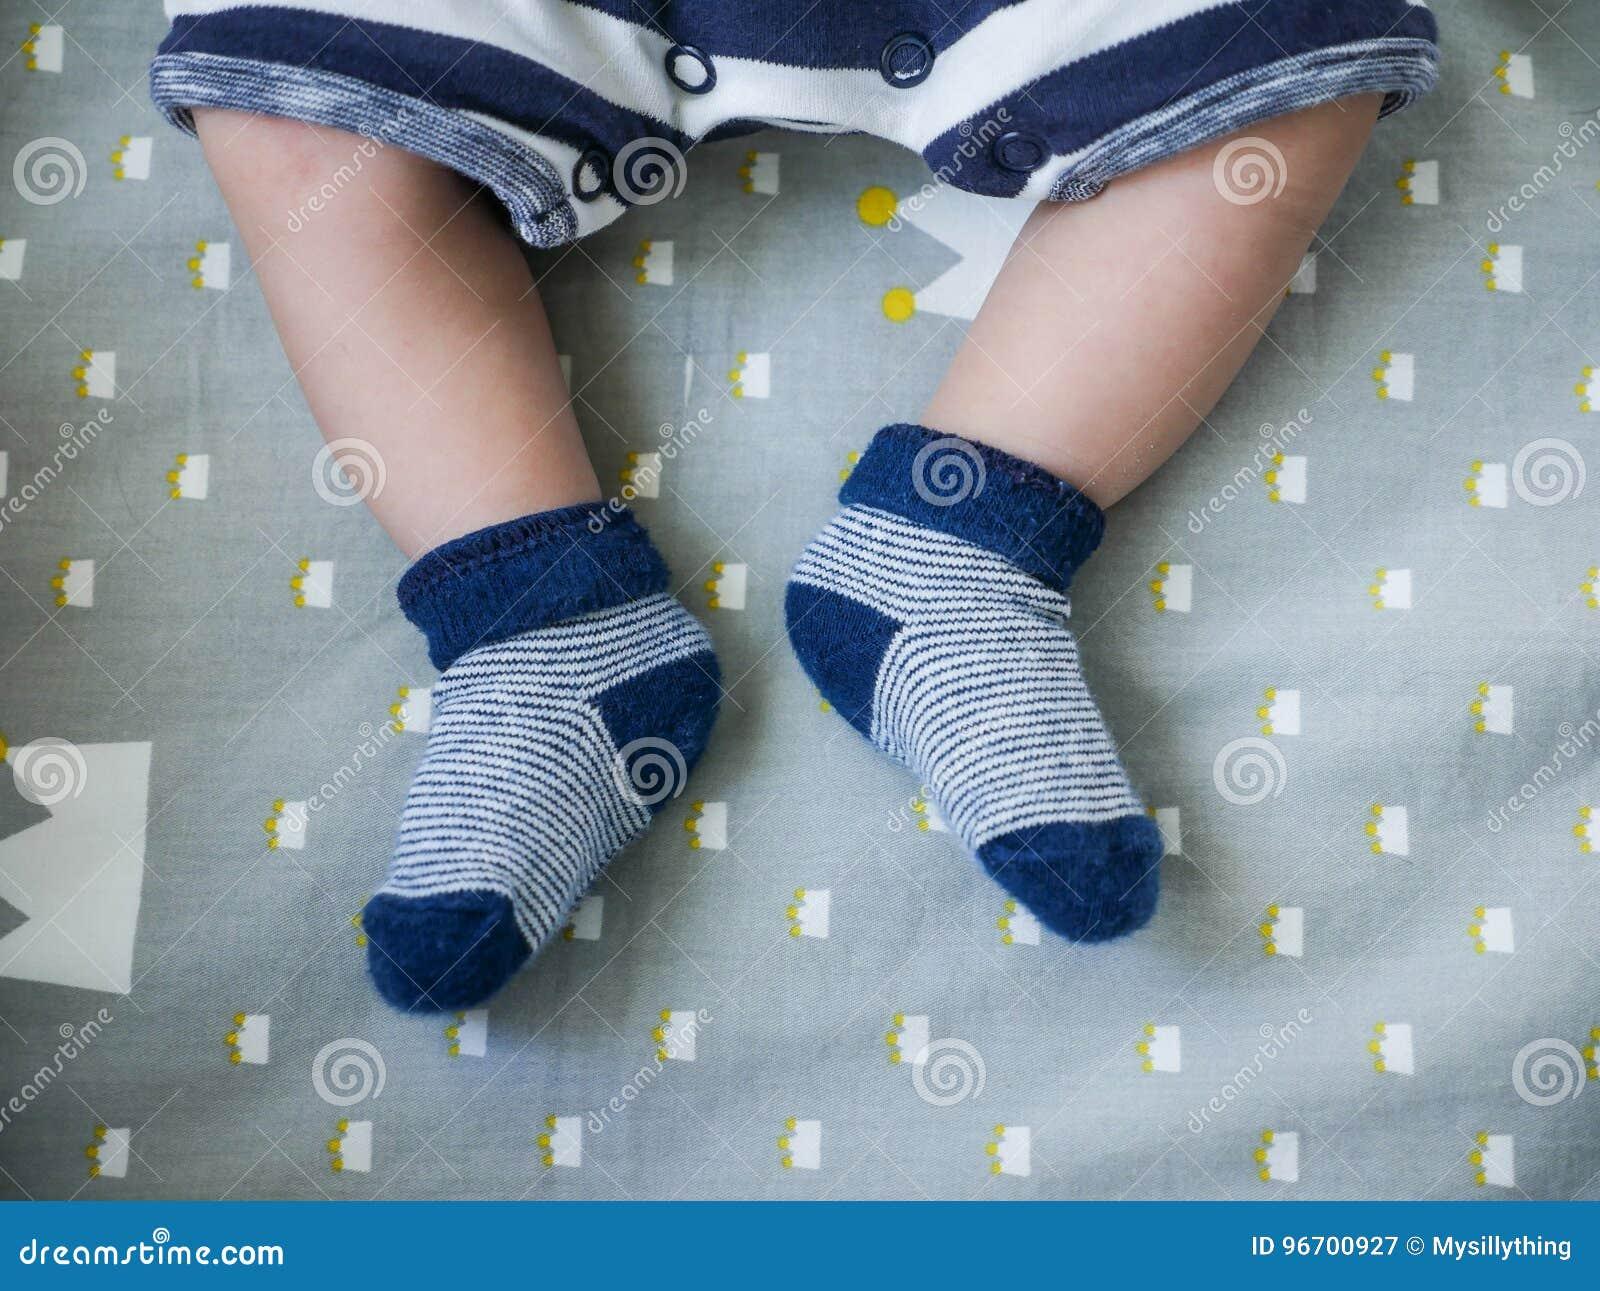 Baby Feets In Blue Socks Keep Baby Feet Warm Stock Image Image